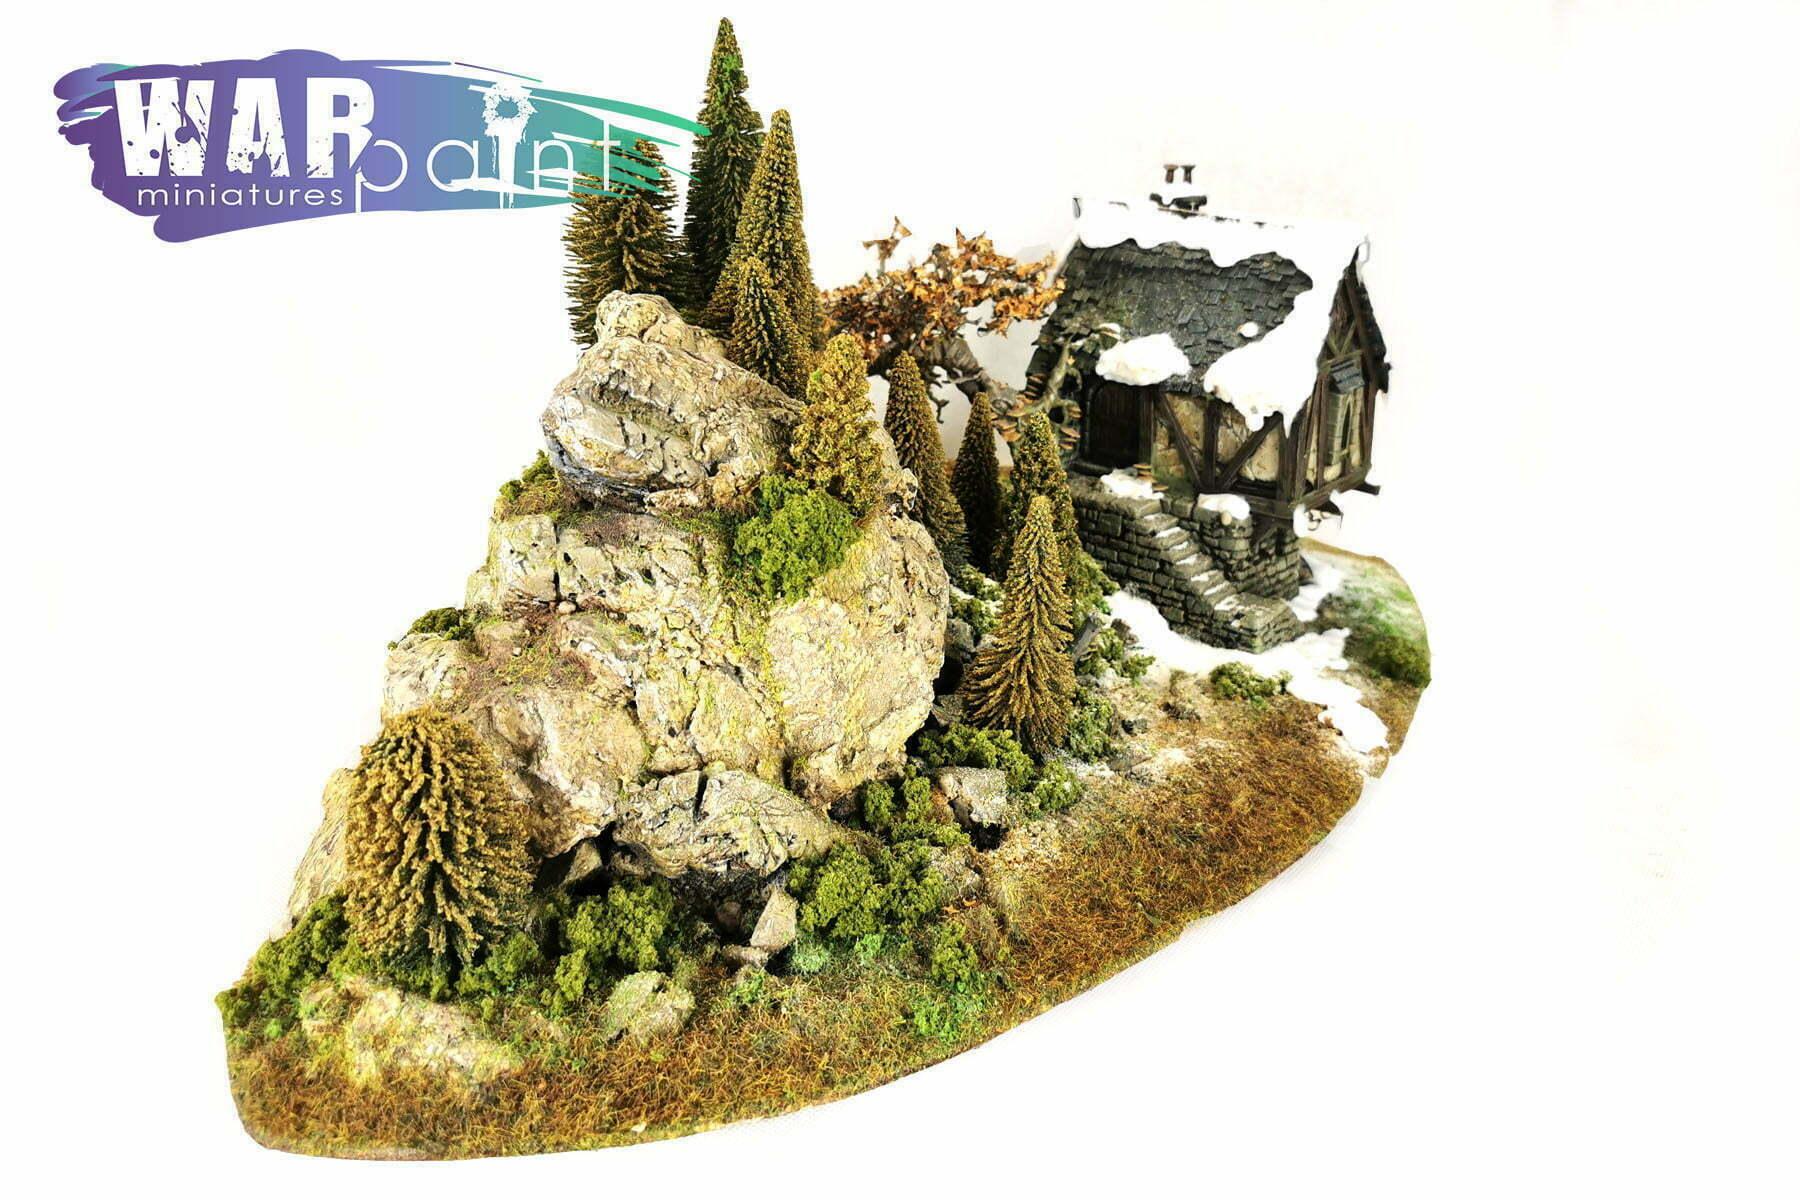 Hunting-Lodge-Scenery-web-optimised-3